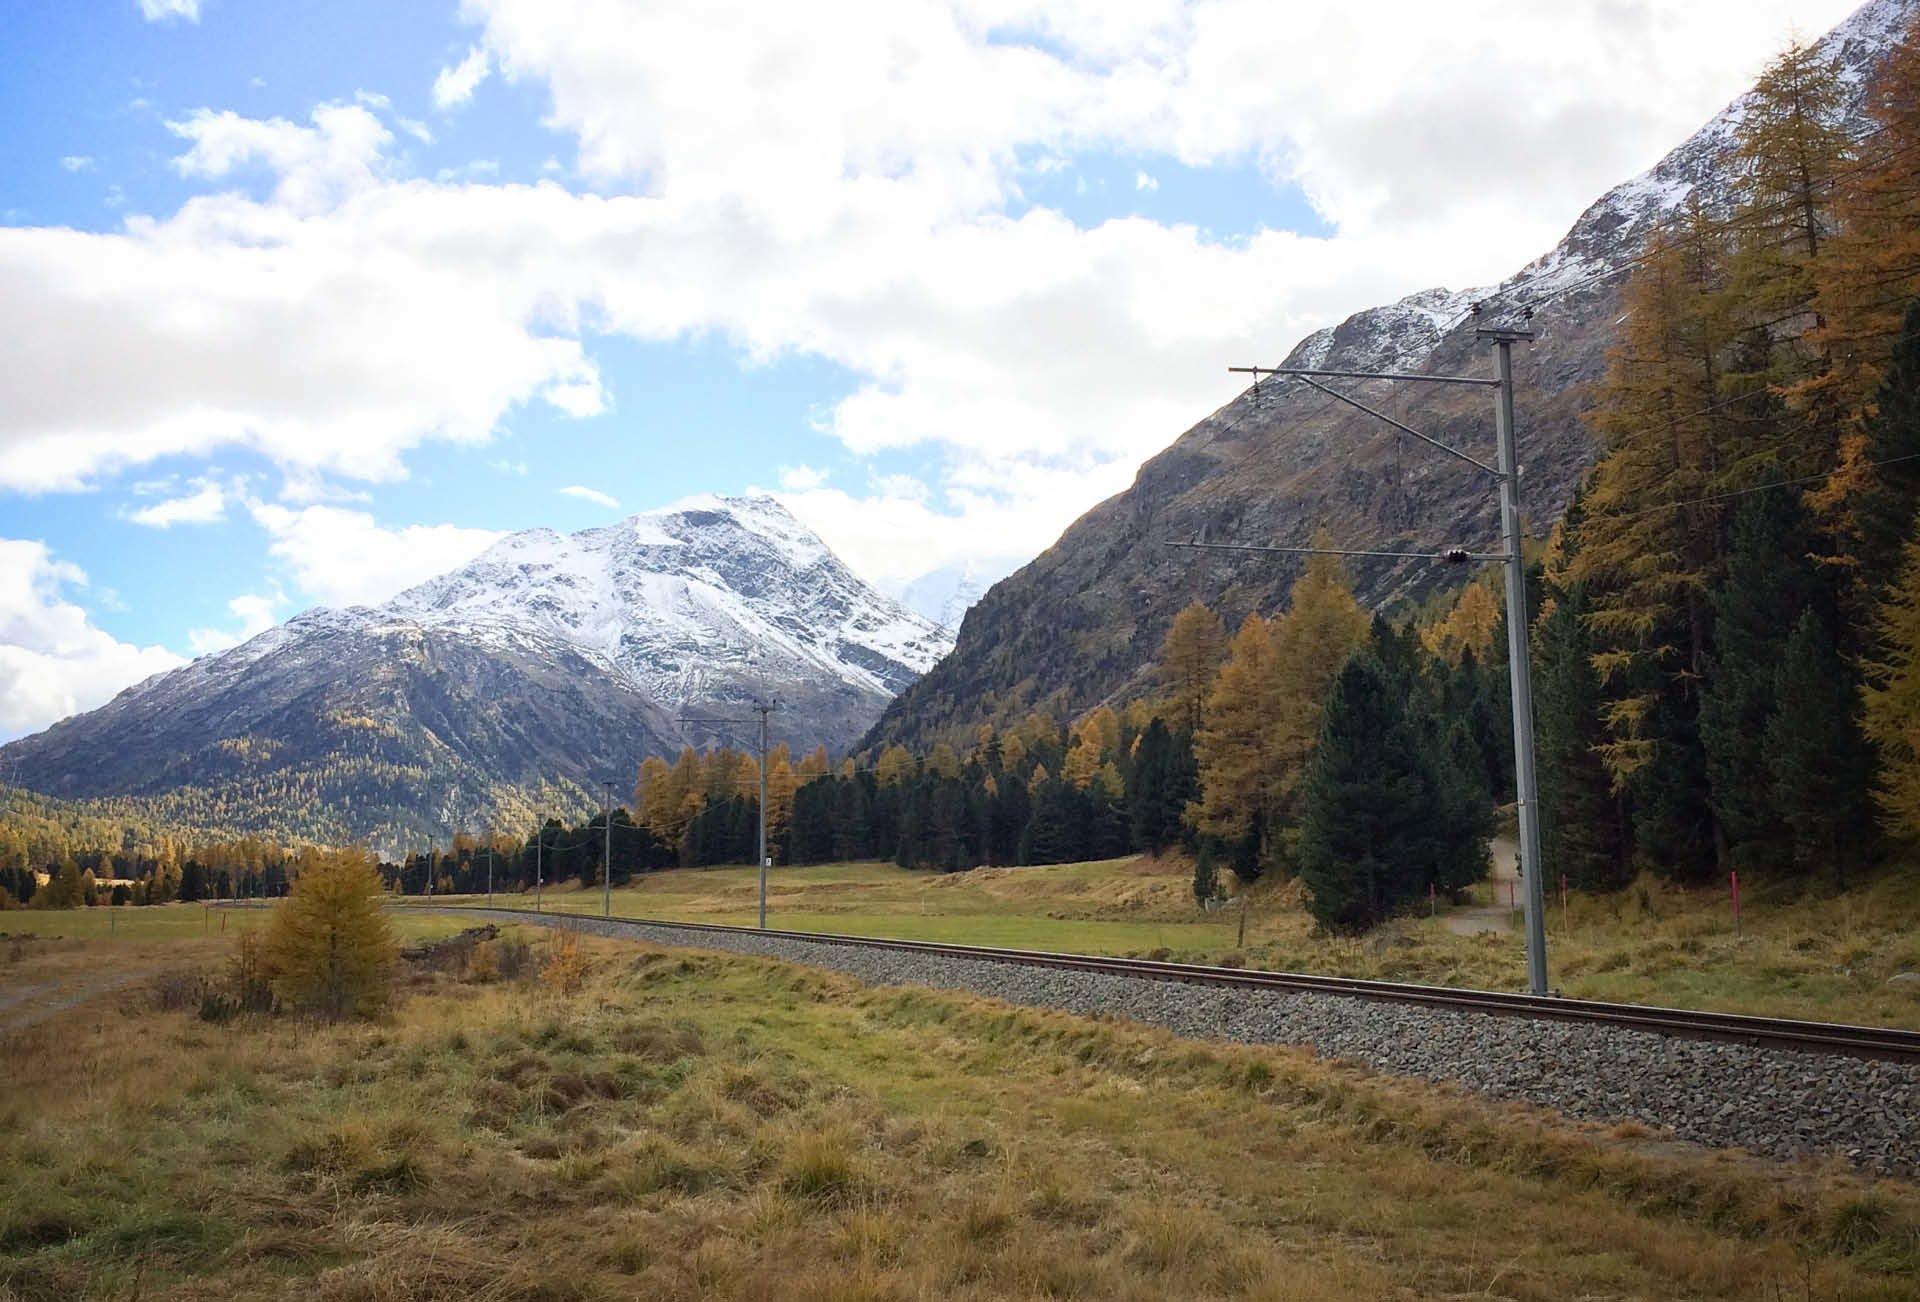 alpenradtour6.jpg